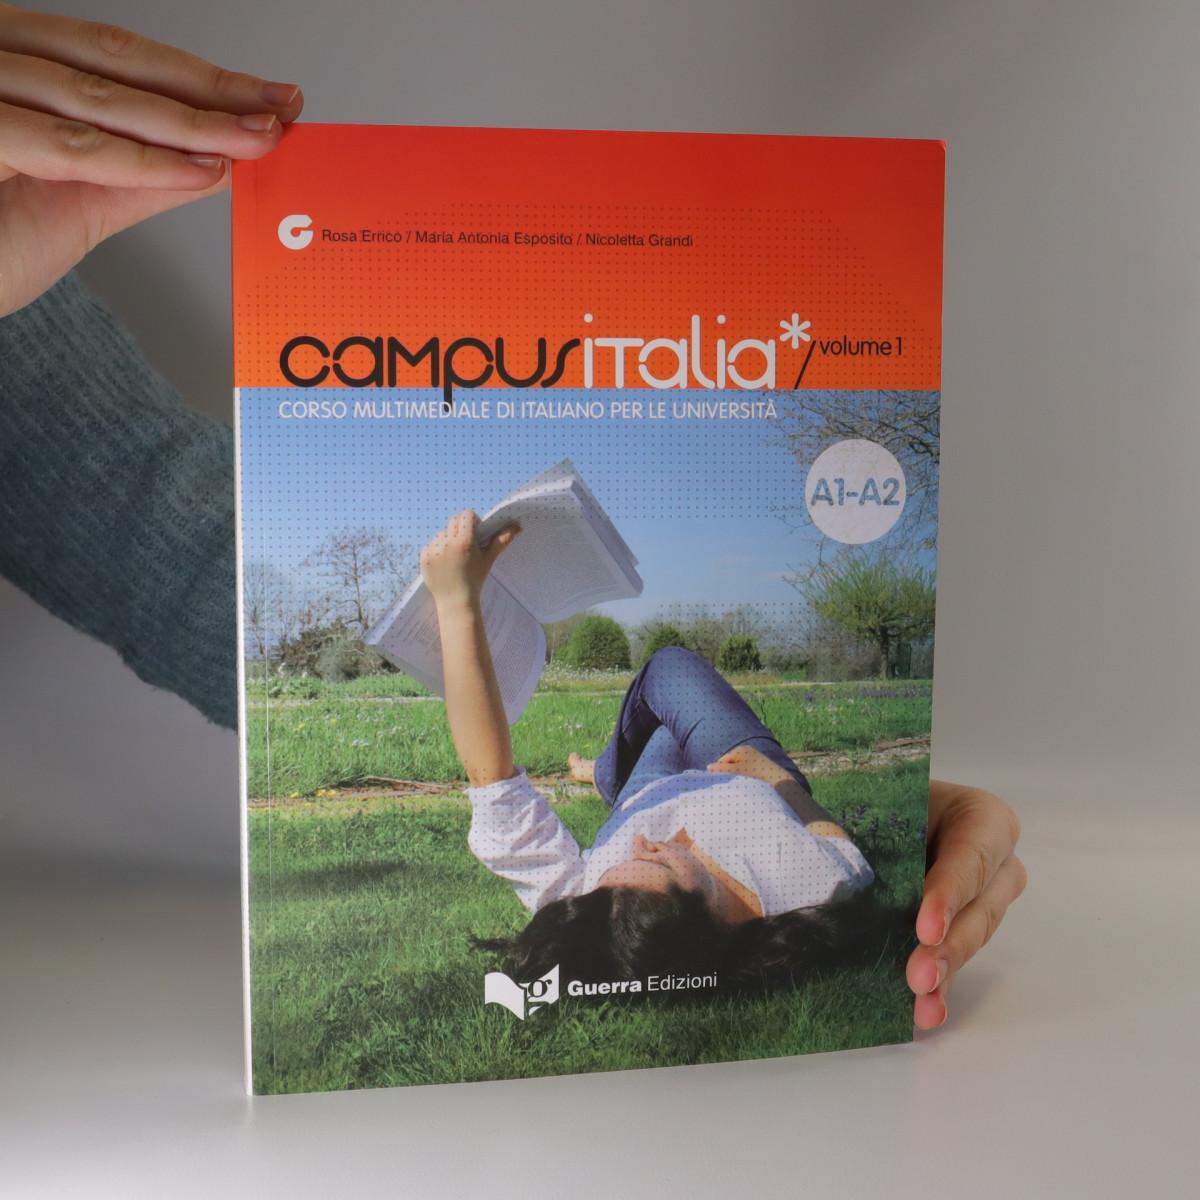 antikvární kniha Campus Italia, neuveden